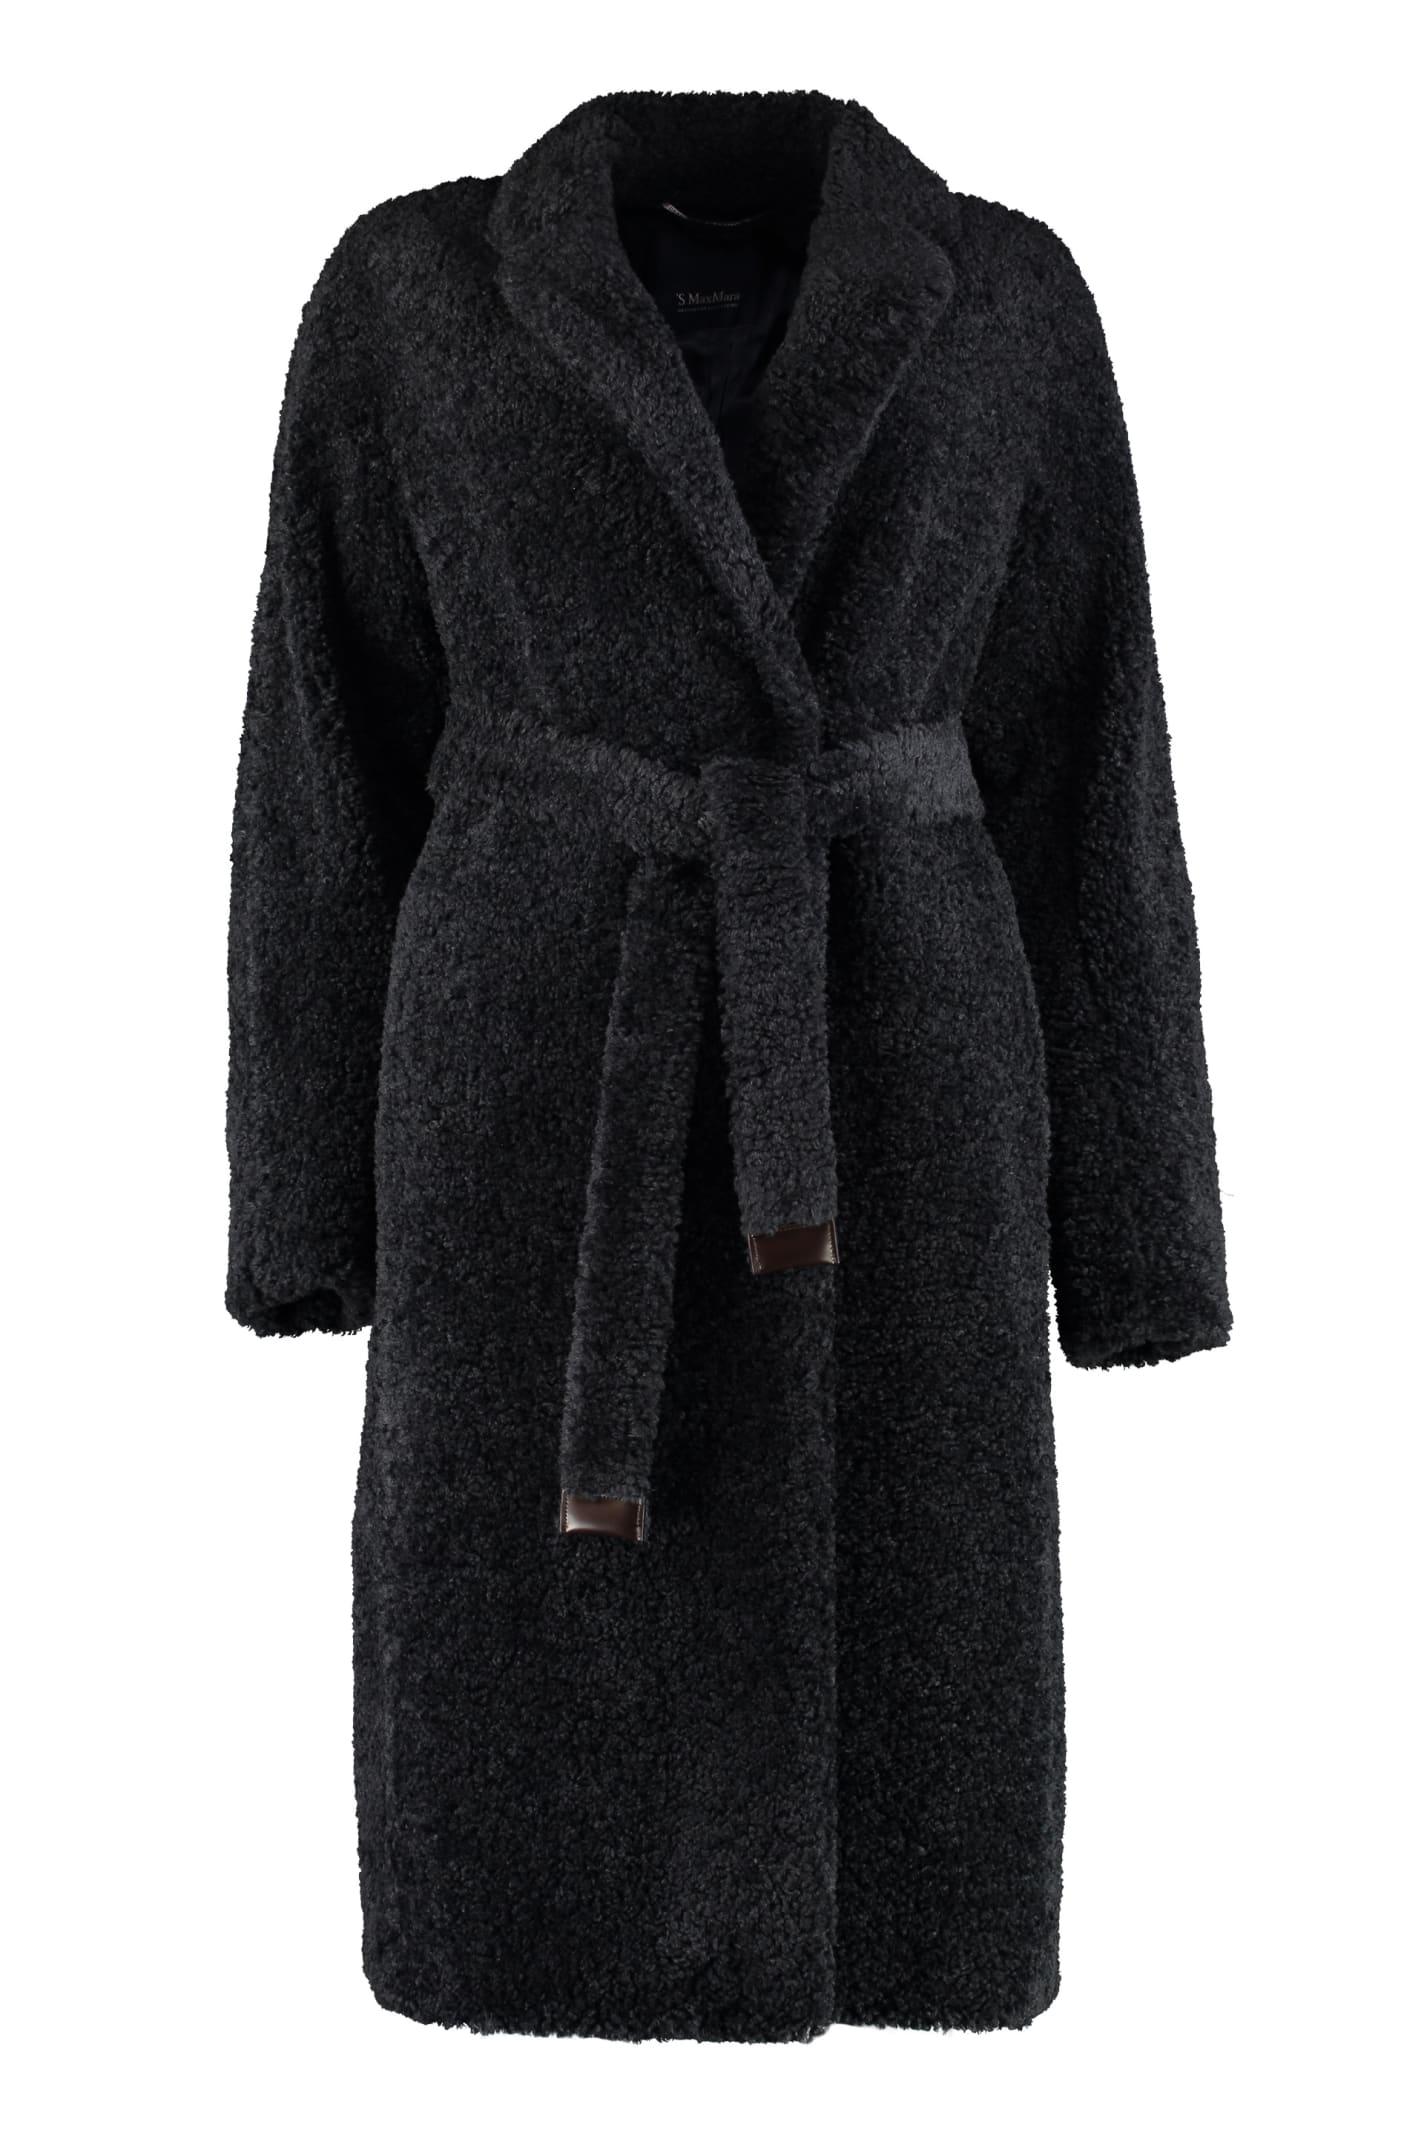 S Max Mara Here is The Cube Agiato Faux Fur Coat